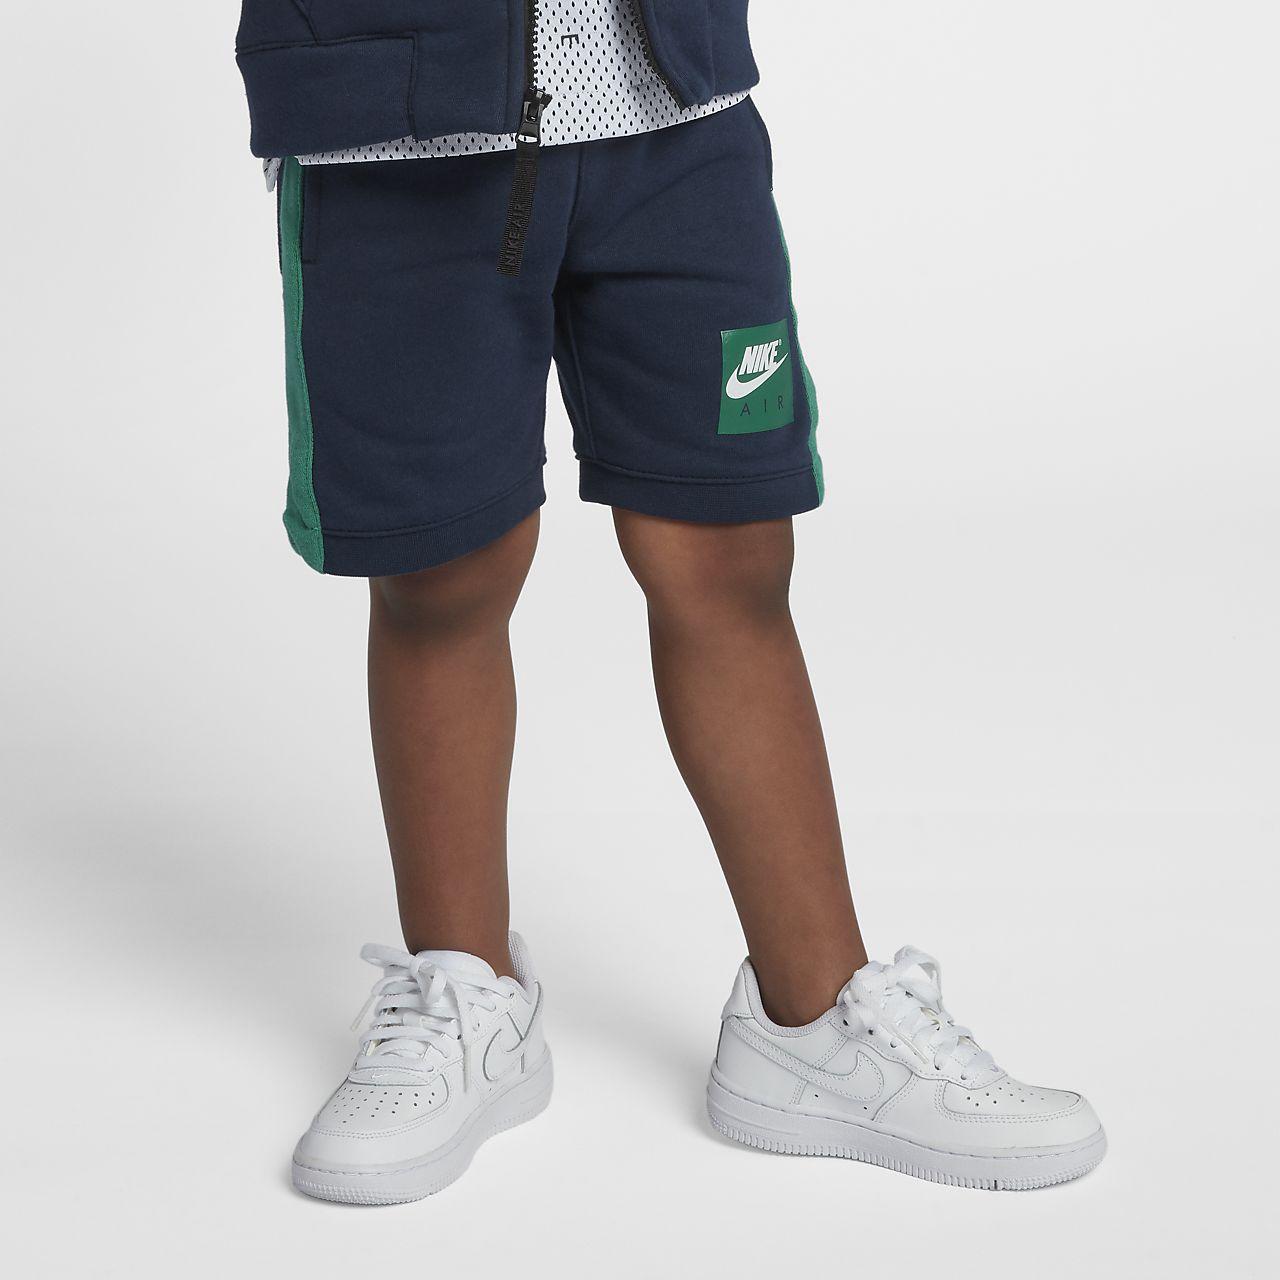 Nl boys' Nike Kids' Knit Air Younger Shorts ftqtwcYSz